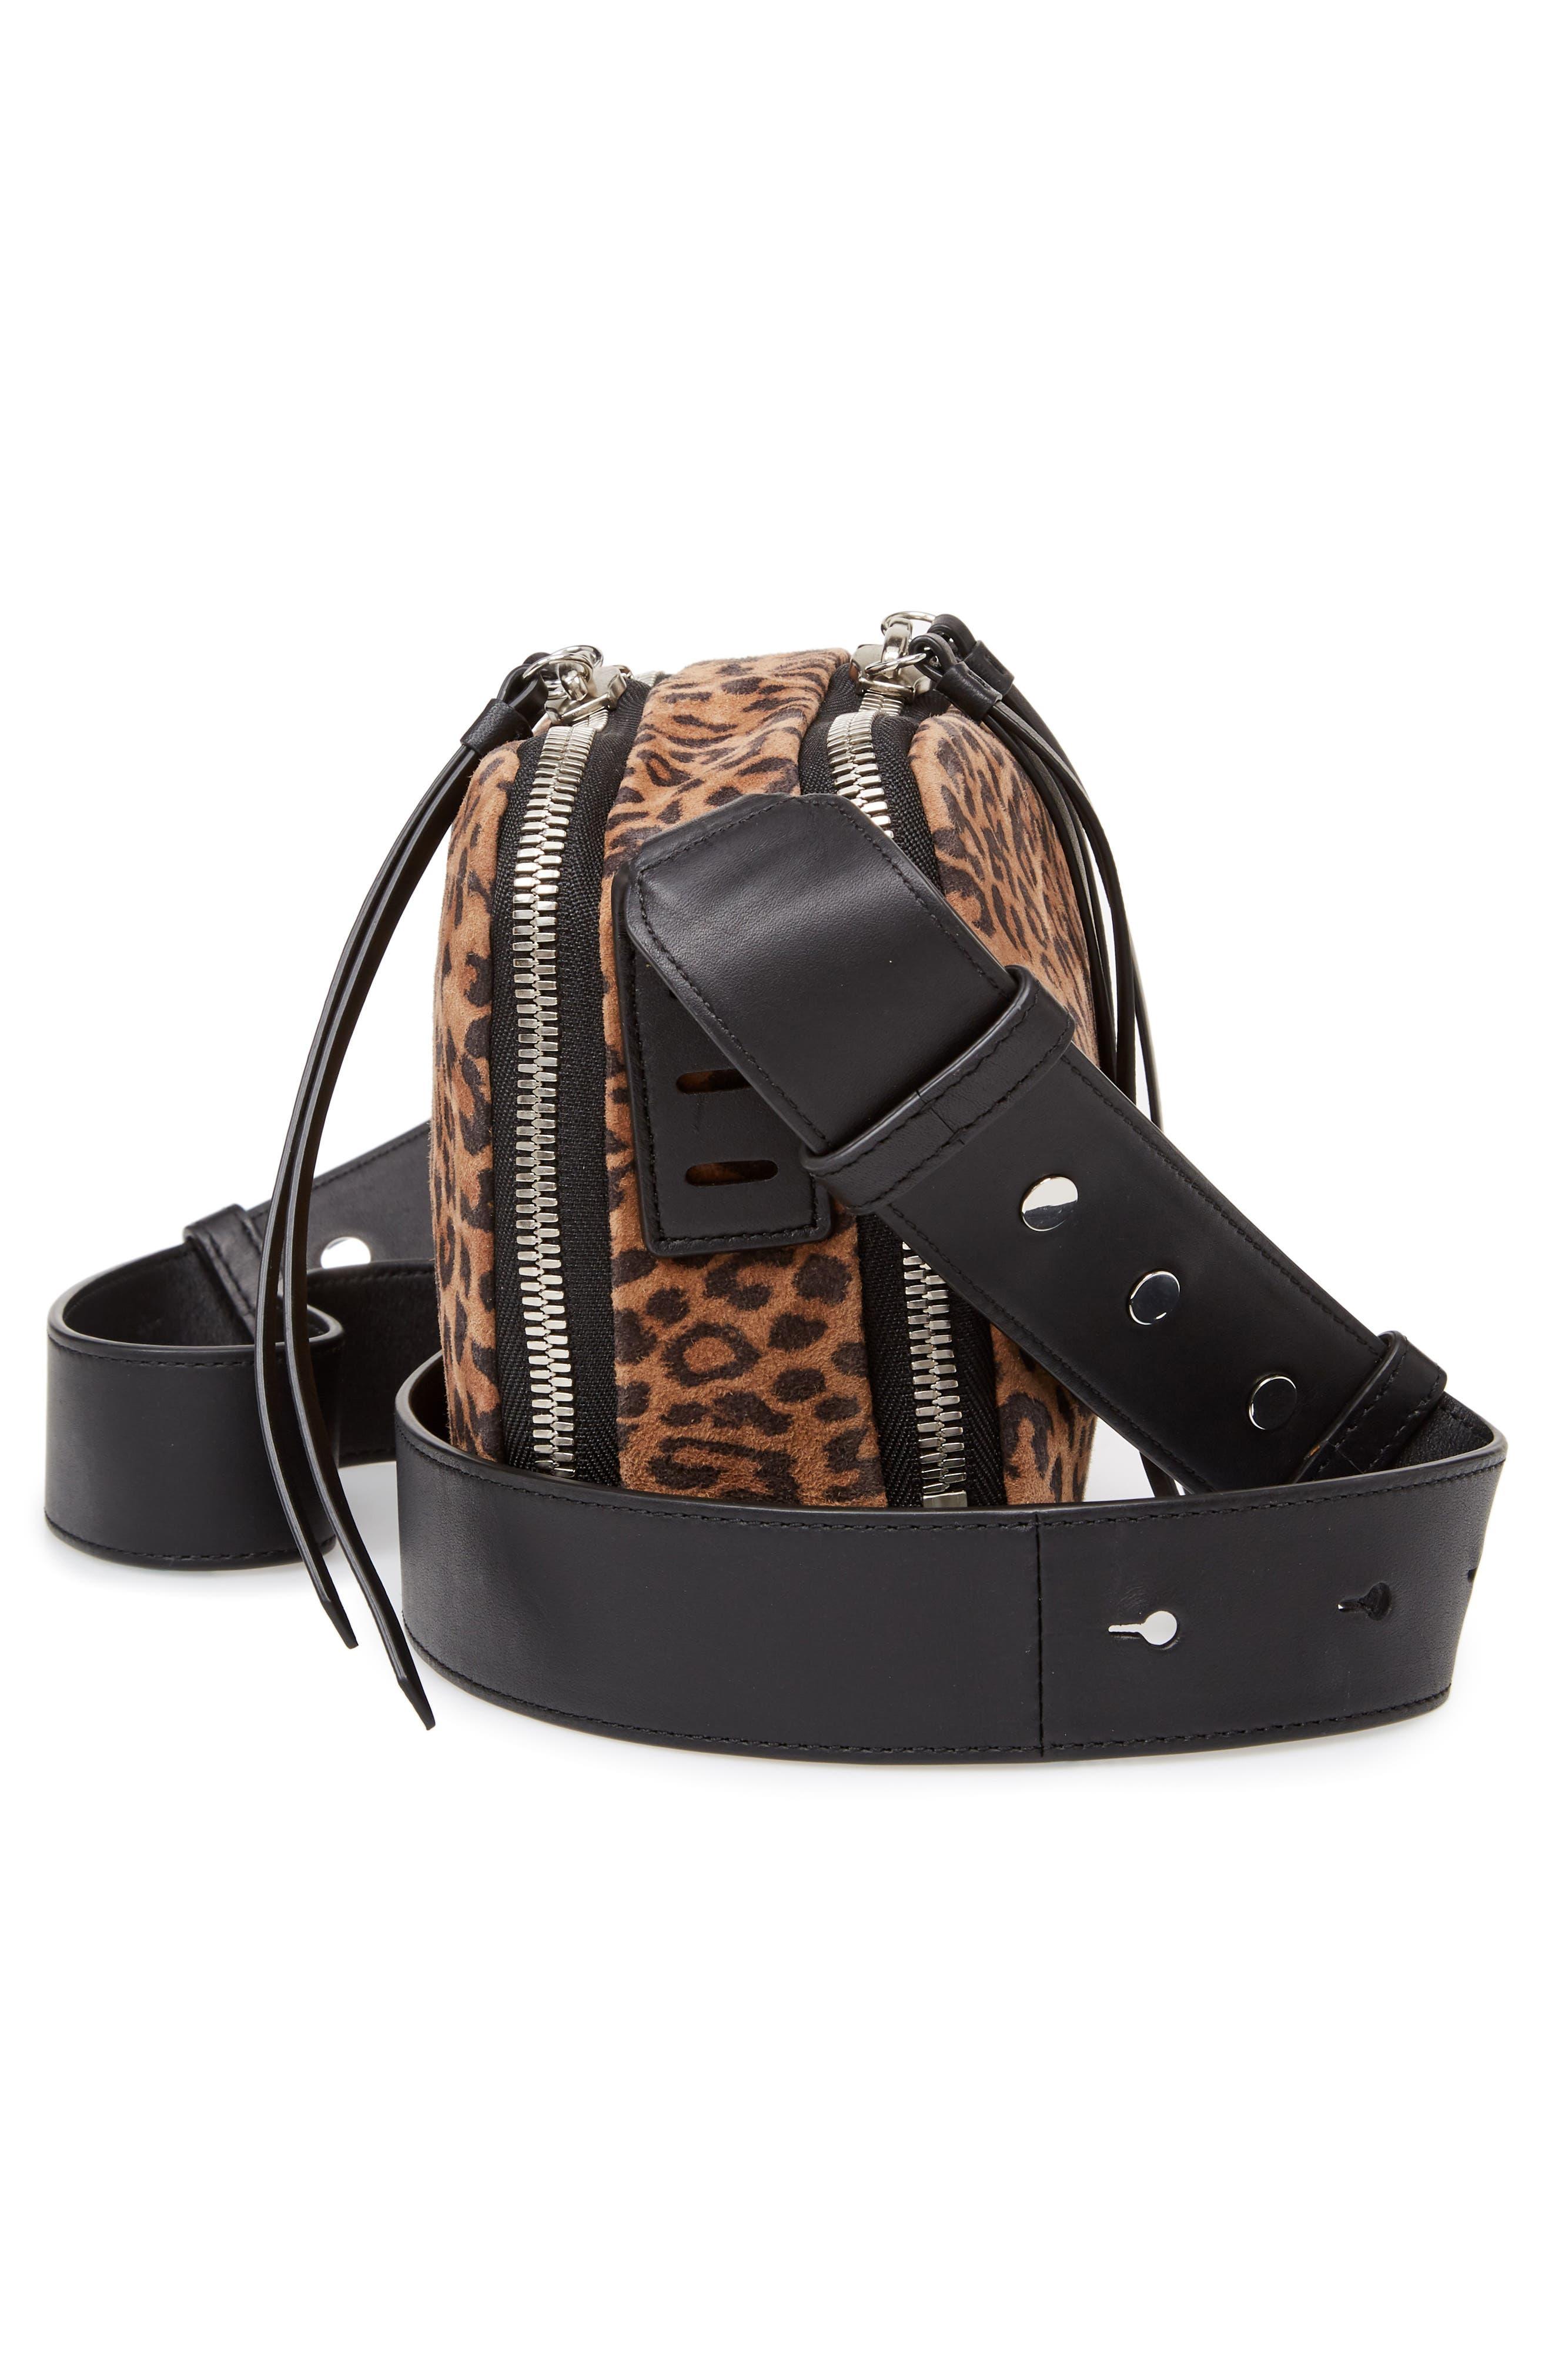 Vincent Leather Crossbody Bag,                             Alternate thumbnail 5, color,                             LEOPARD/ BLACK